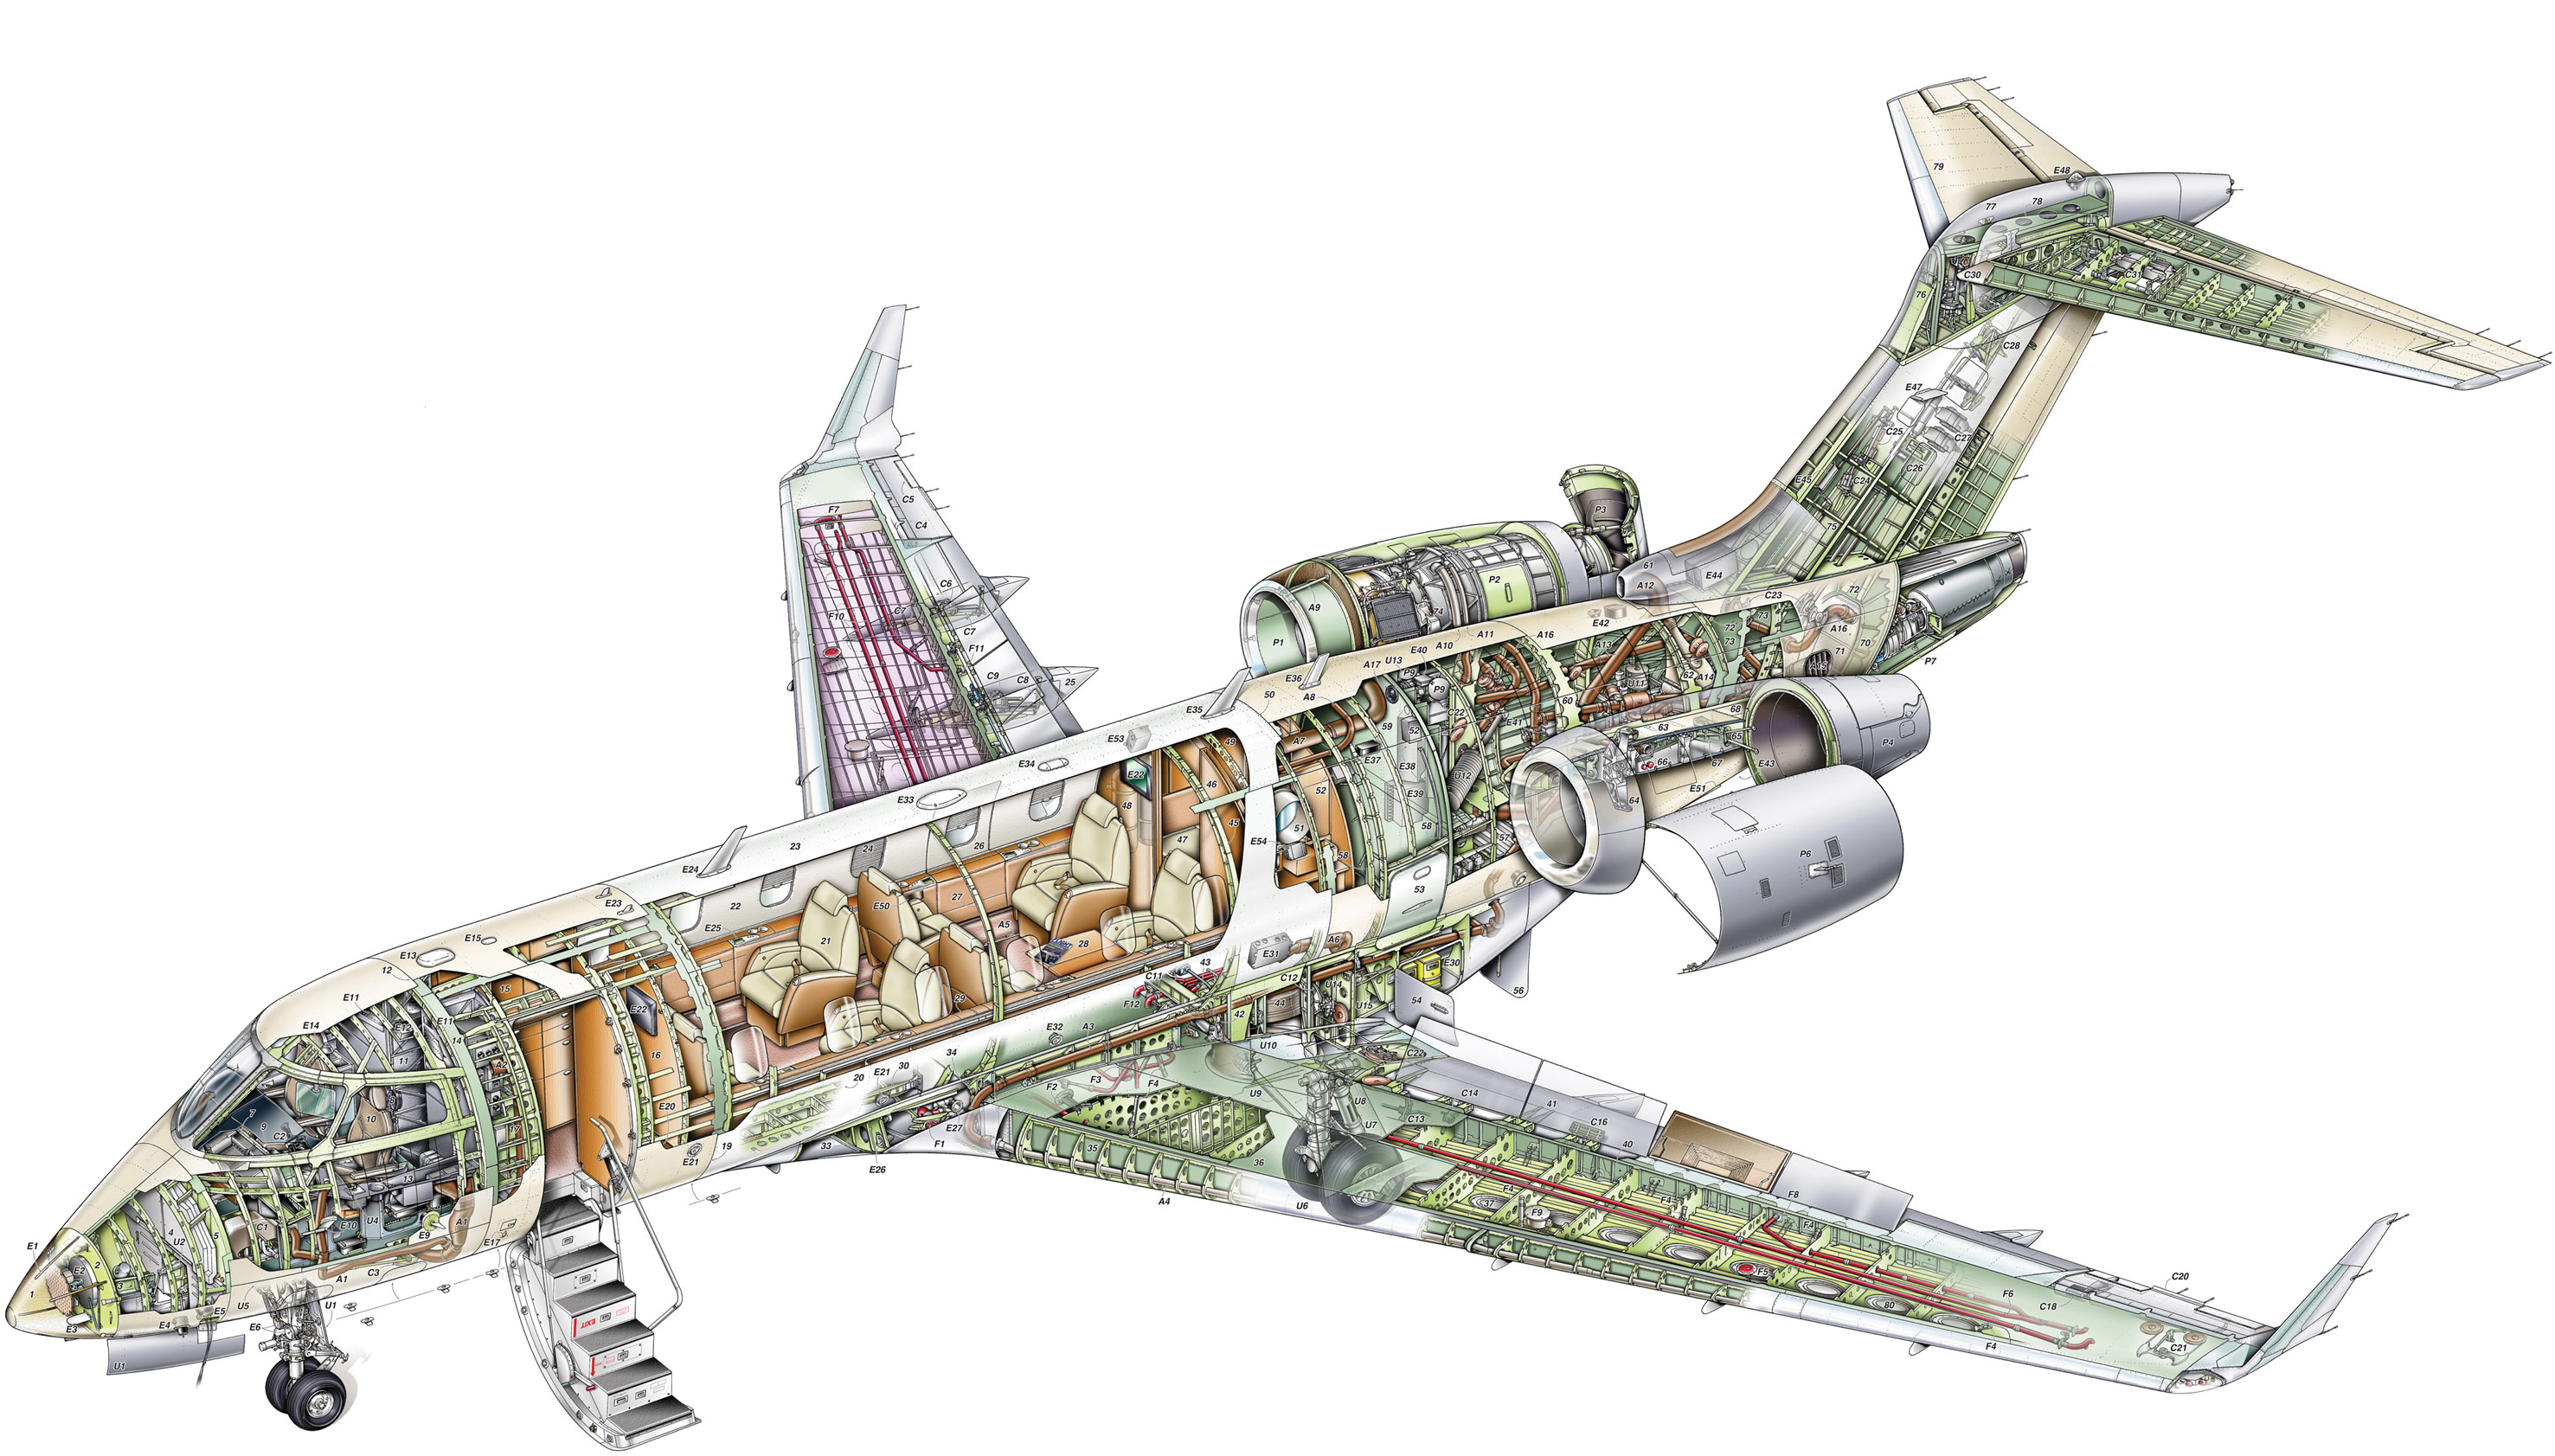 Bombardier Challenger 300 cutaway